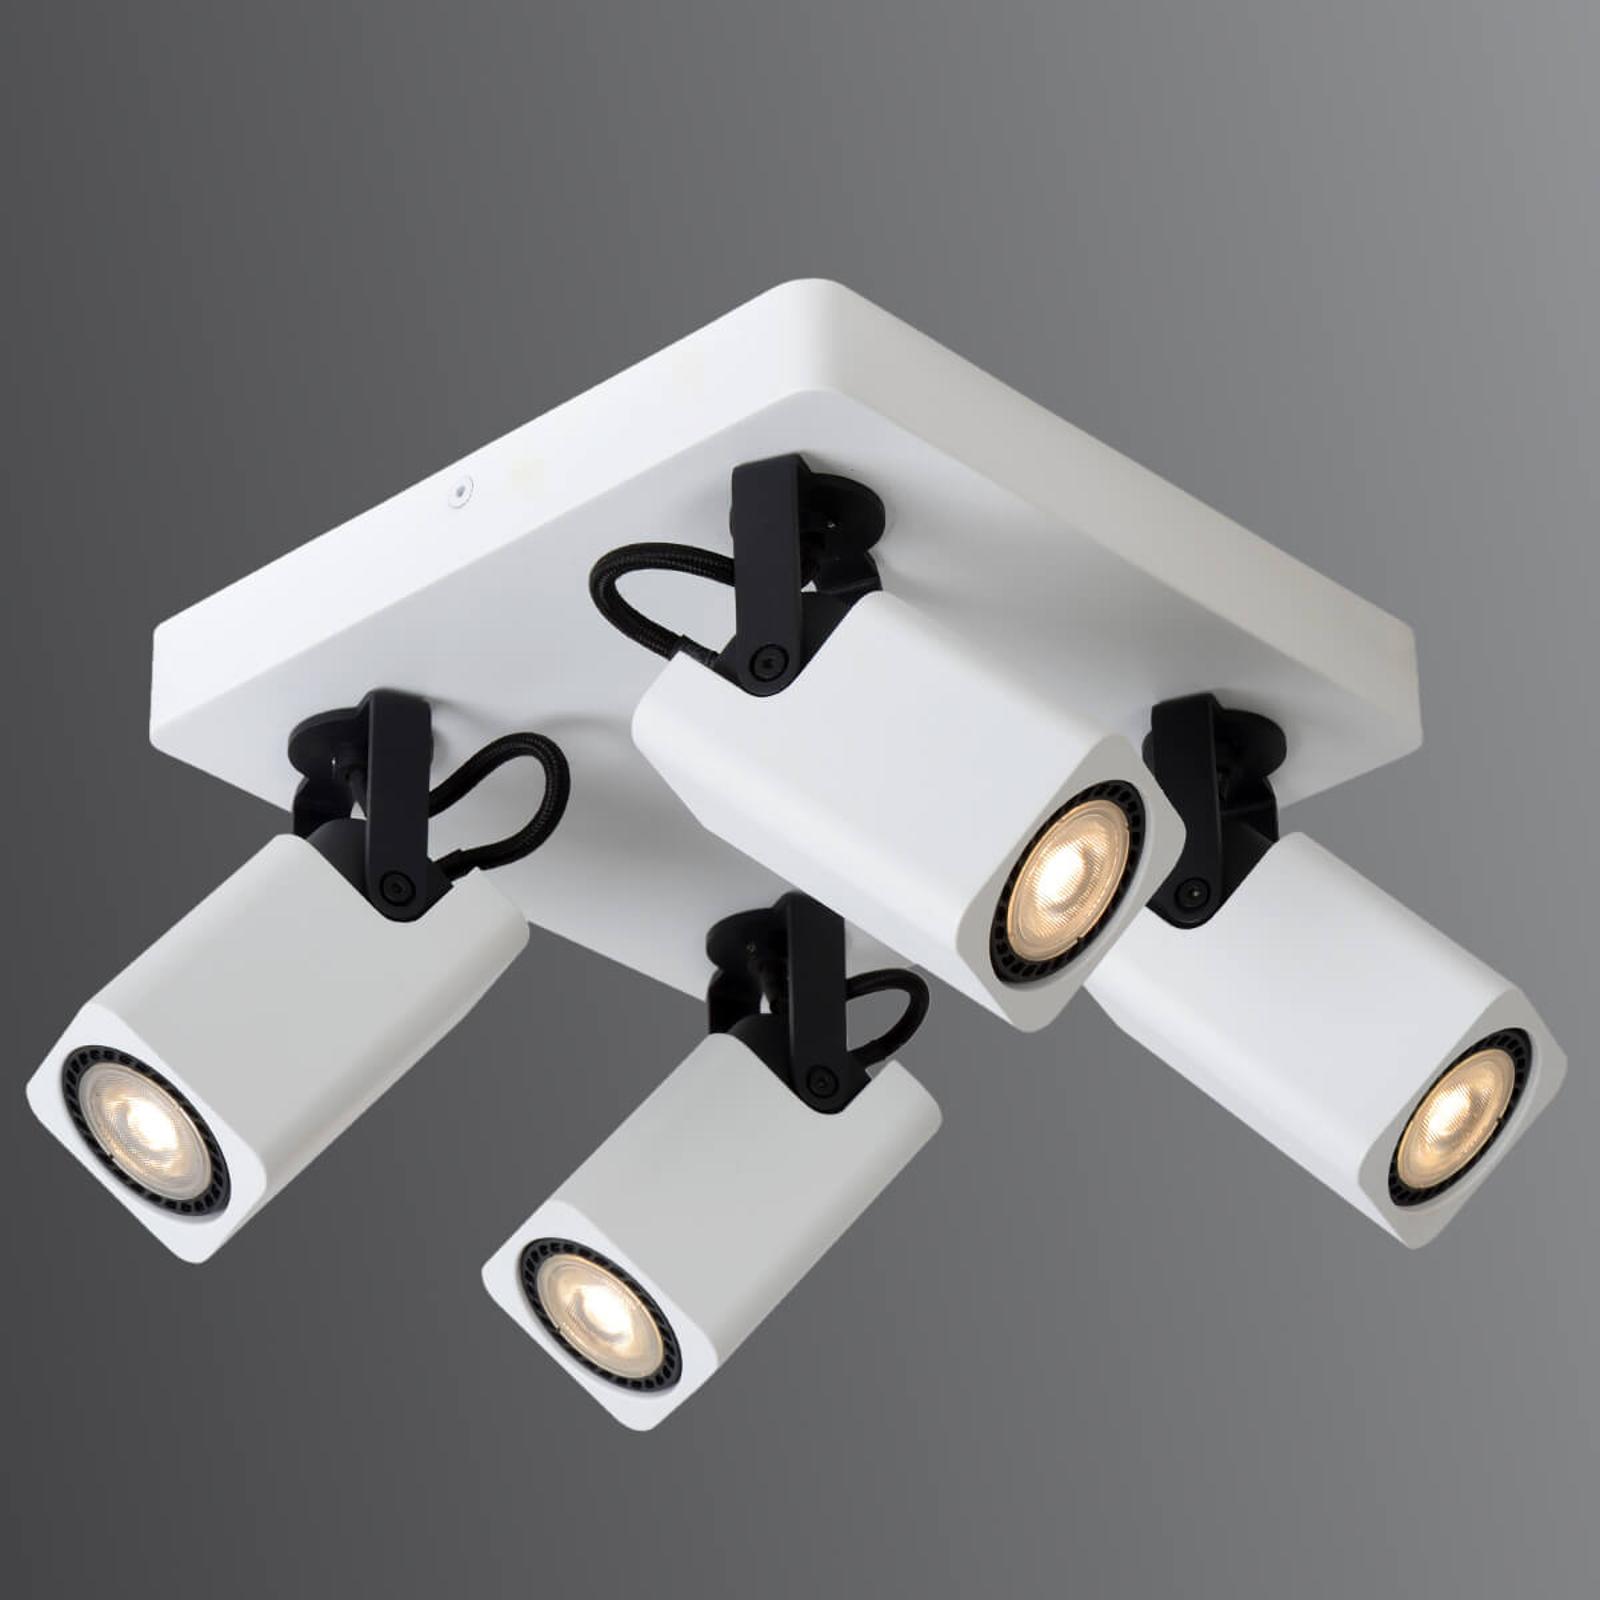 Roax LED-taklampe 4 lyskilder